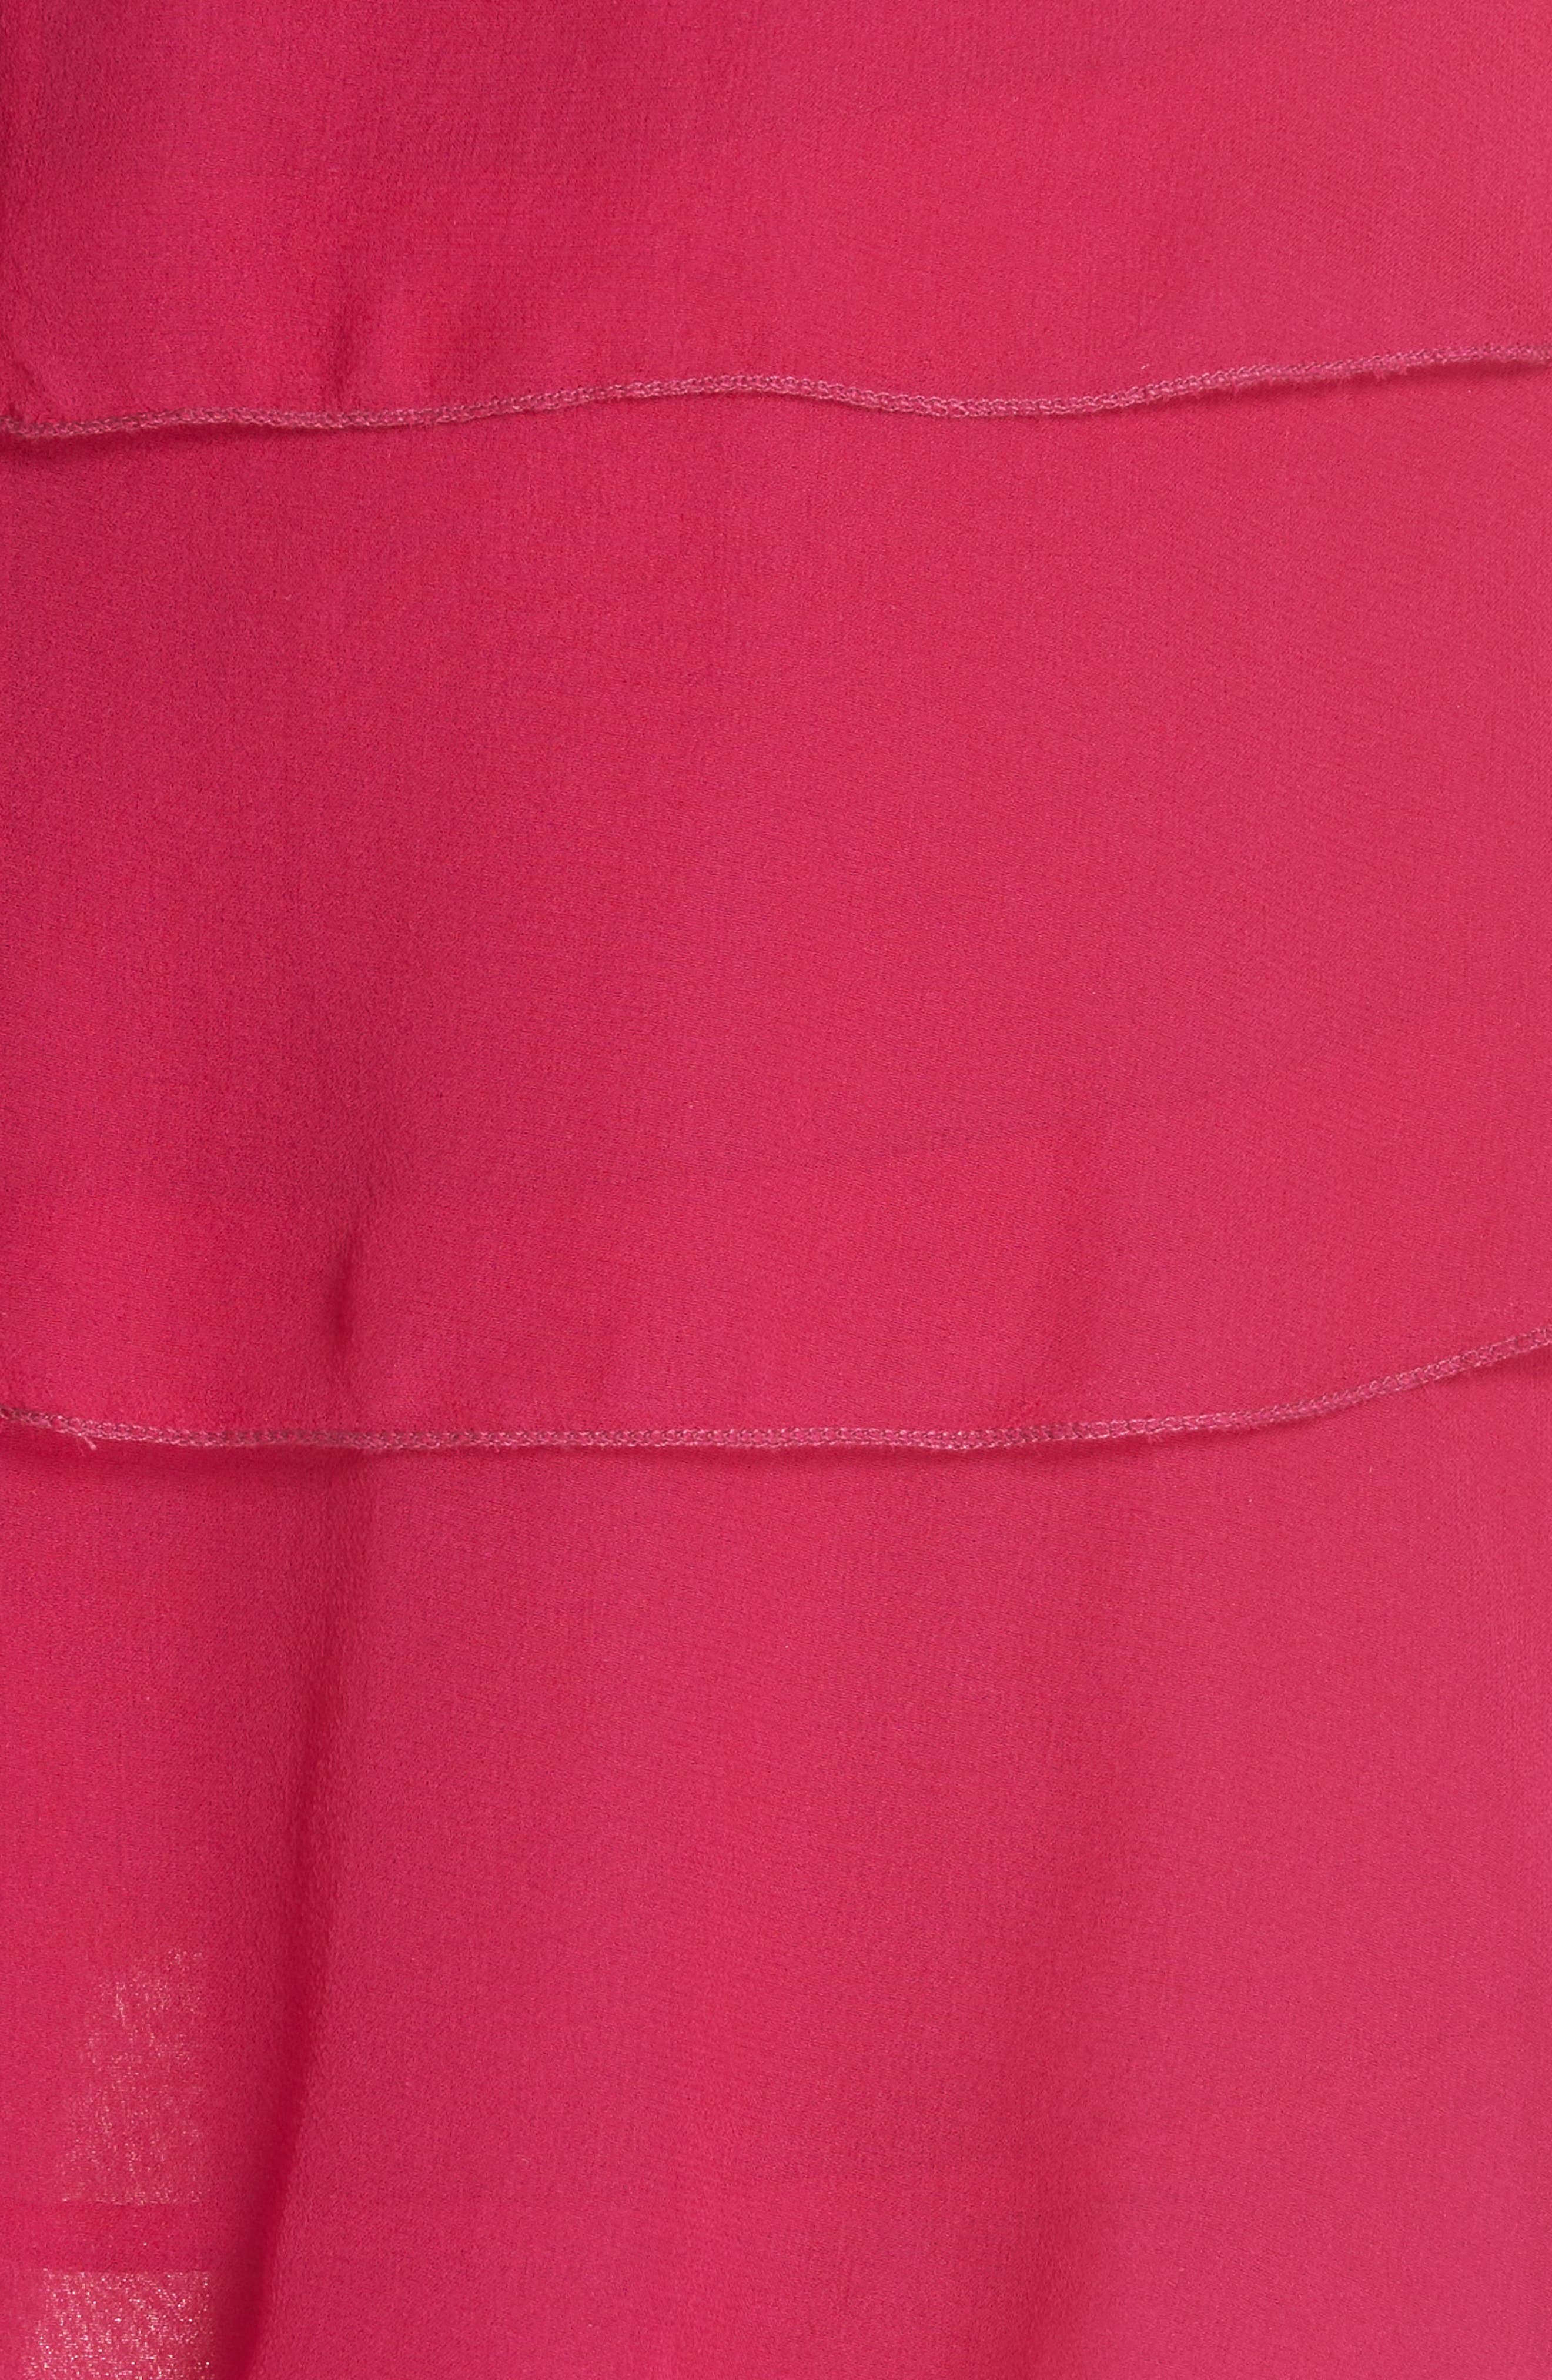 ALICE + OLIVIA,                             Felicita Ruffle Silk Dress,                             Alternate thumbnail 5, color,                             601